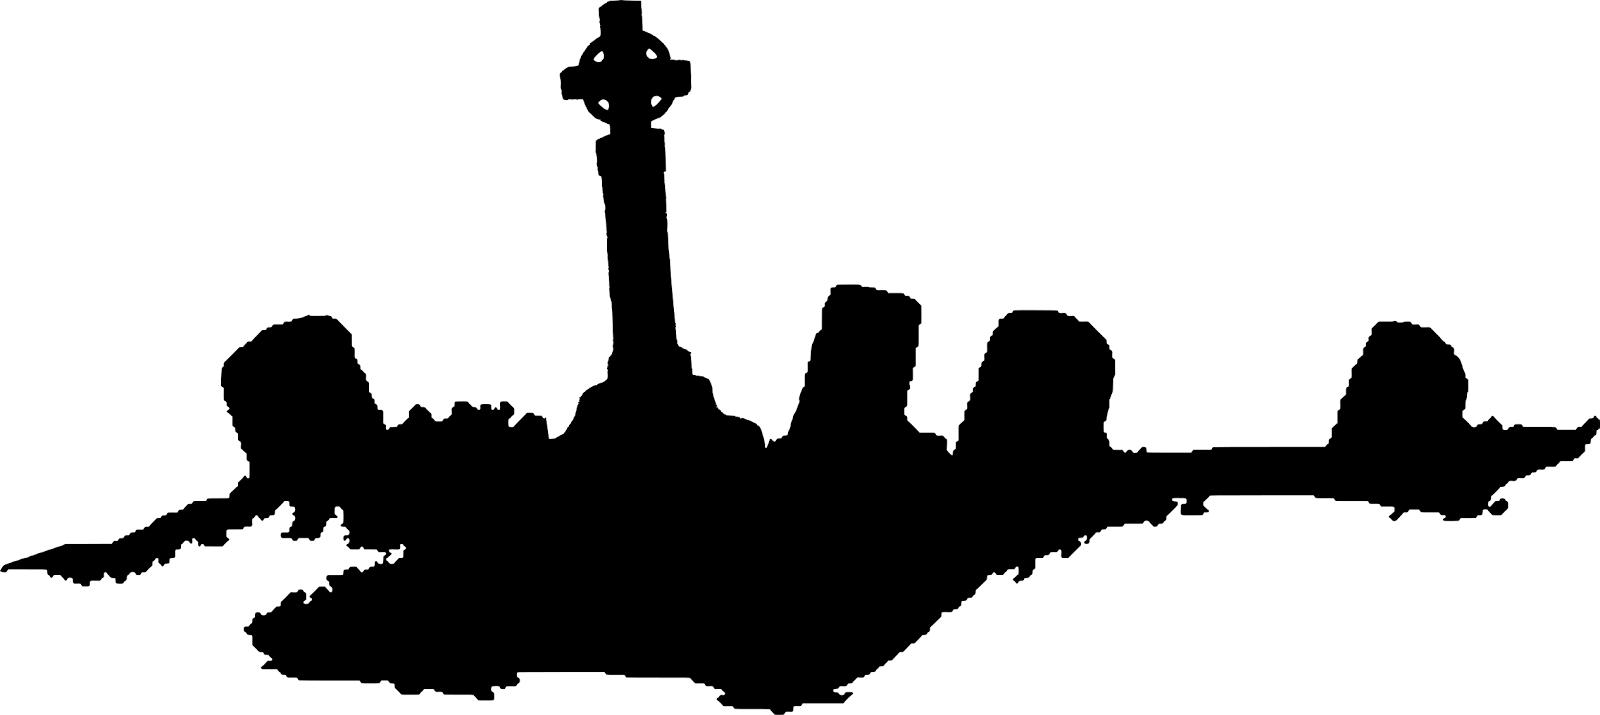 Graveyard Silhouette Clip Art